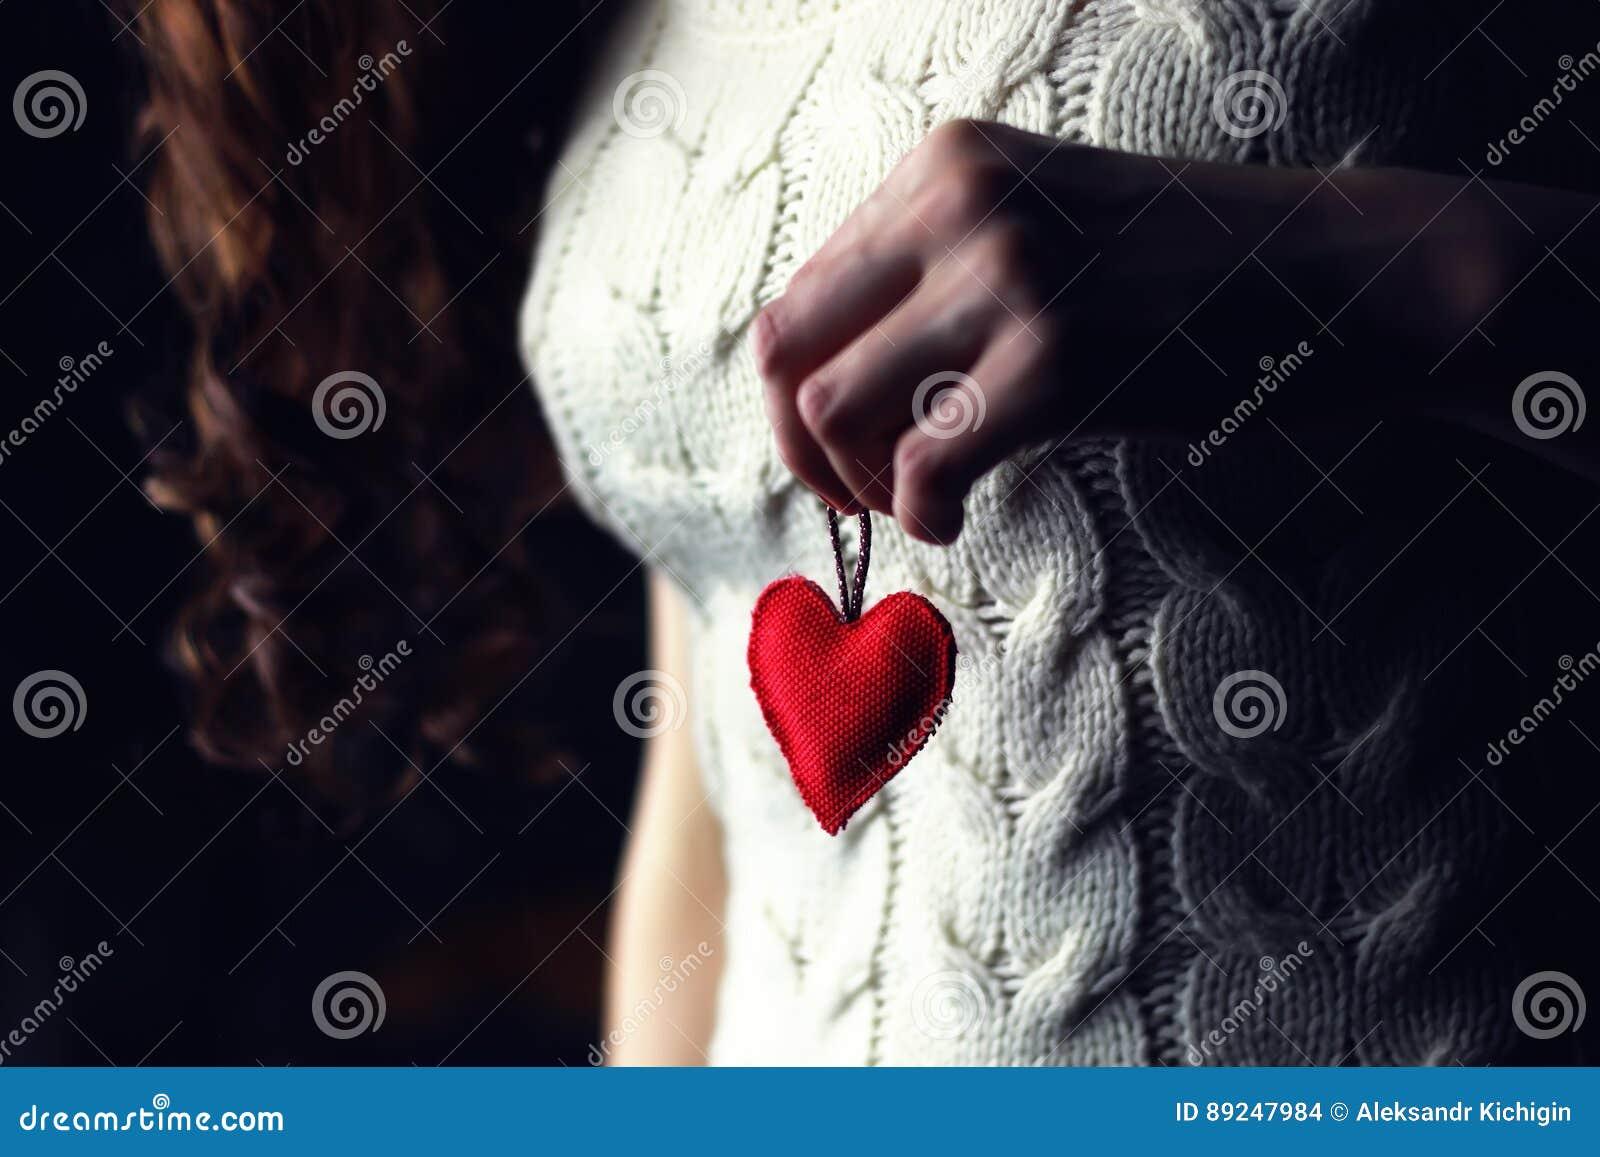 Female hands heart breast love